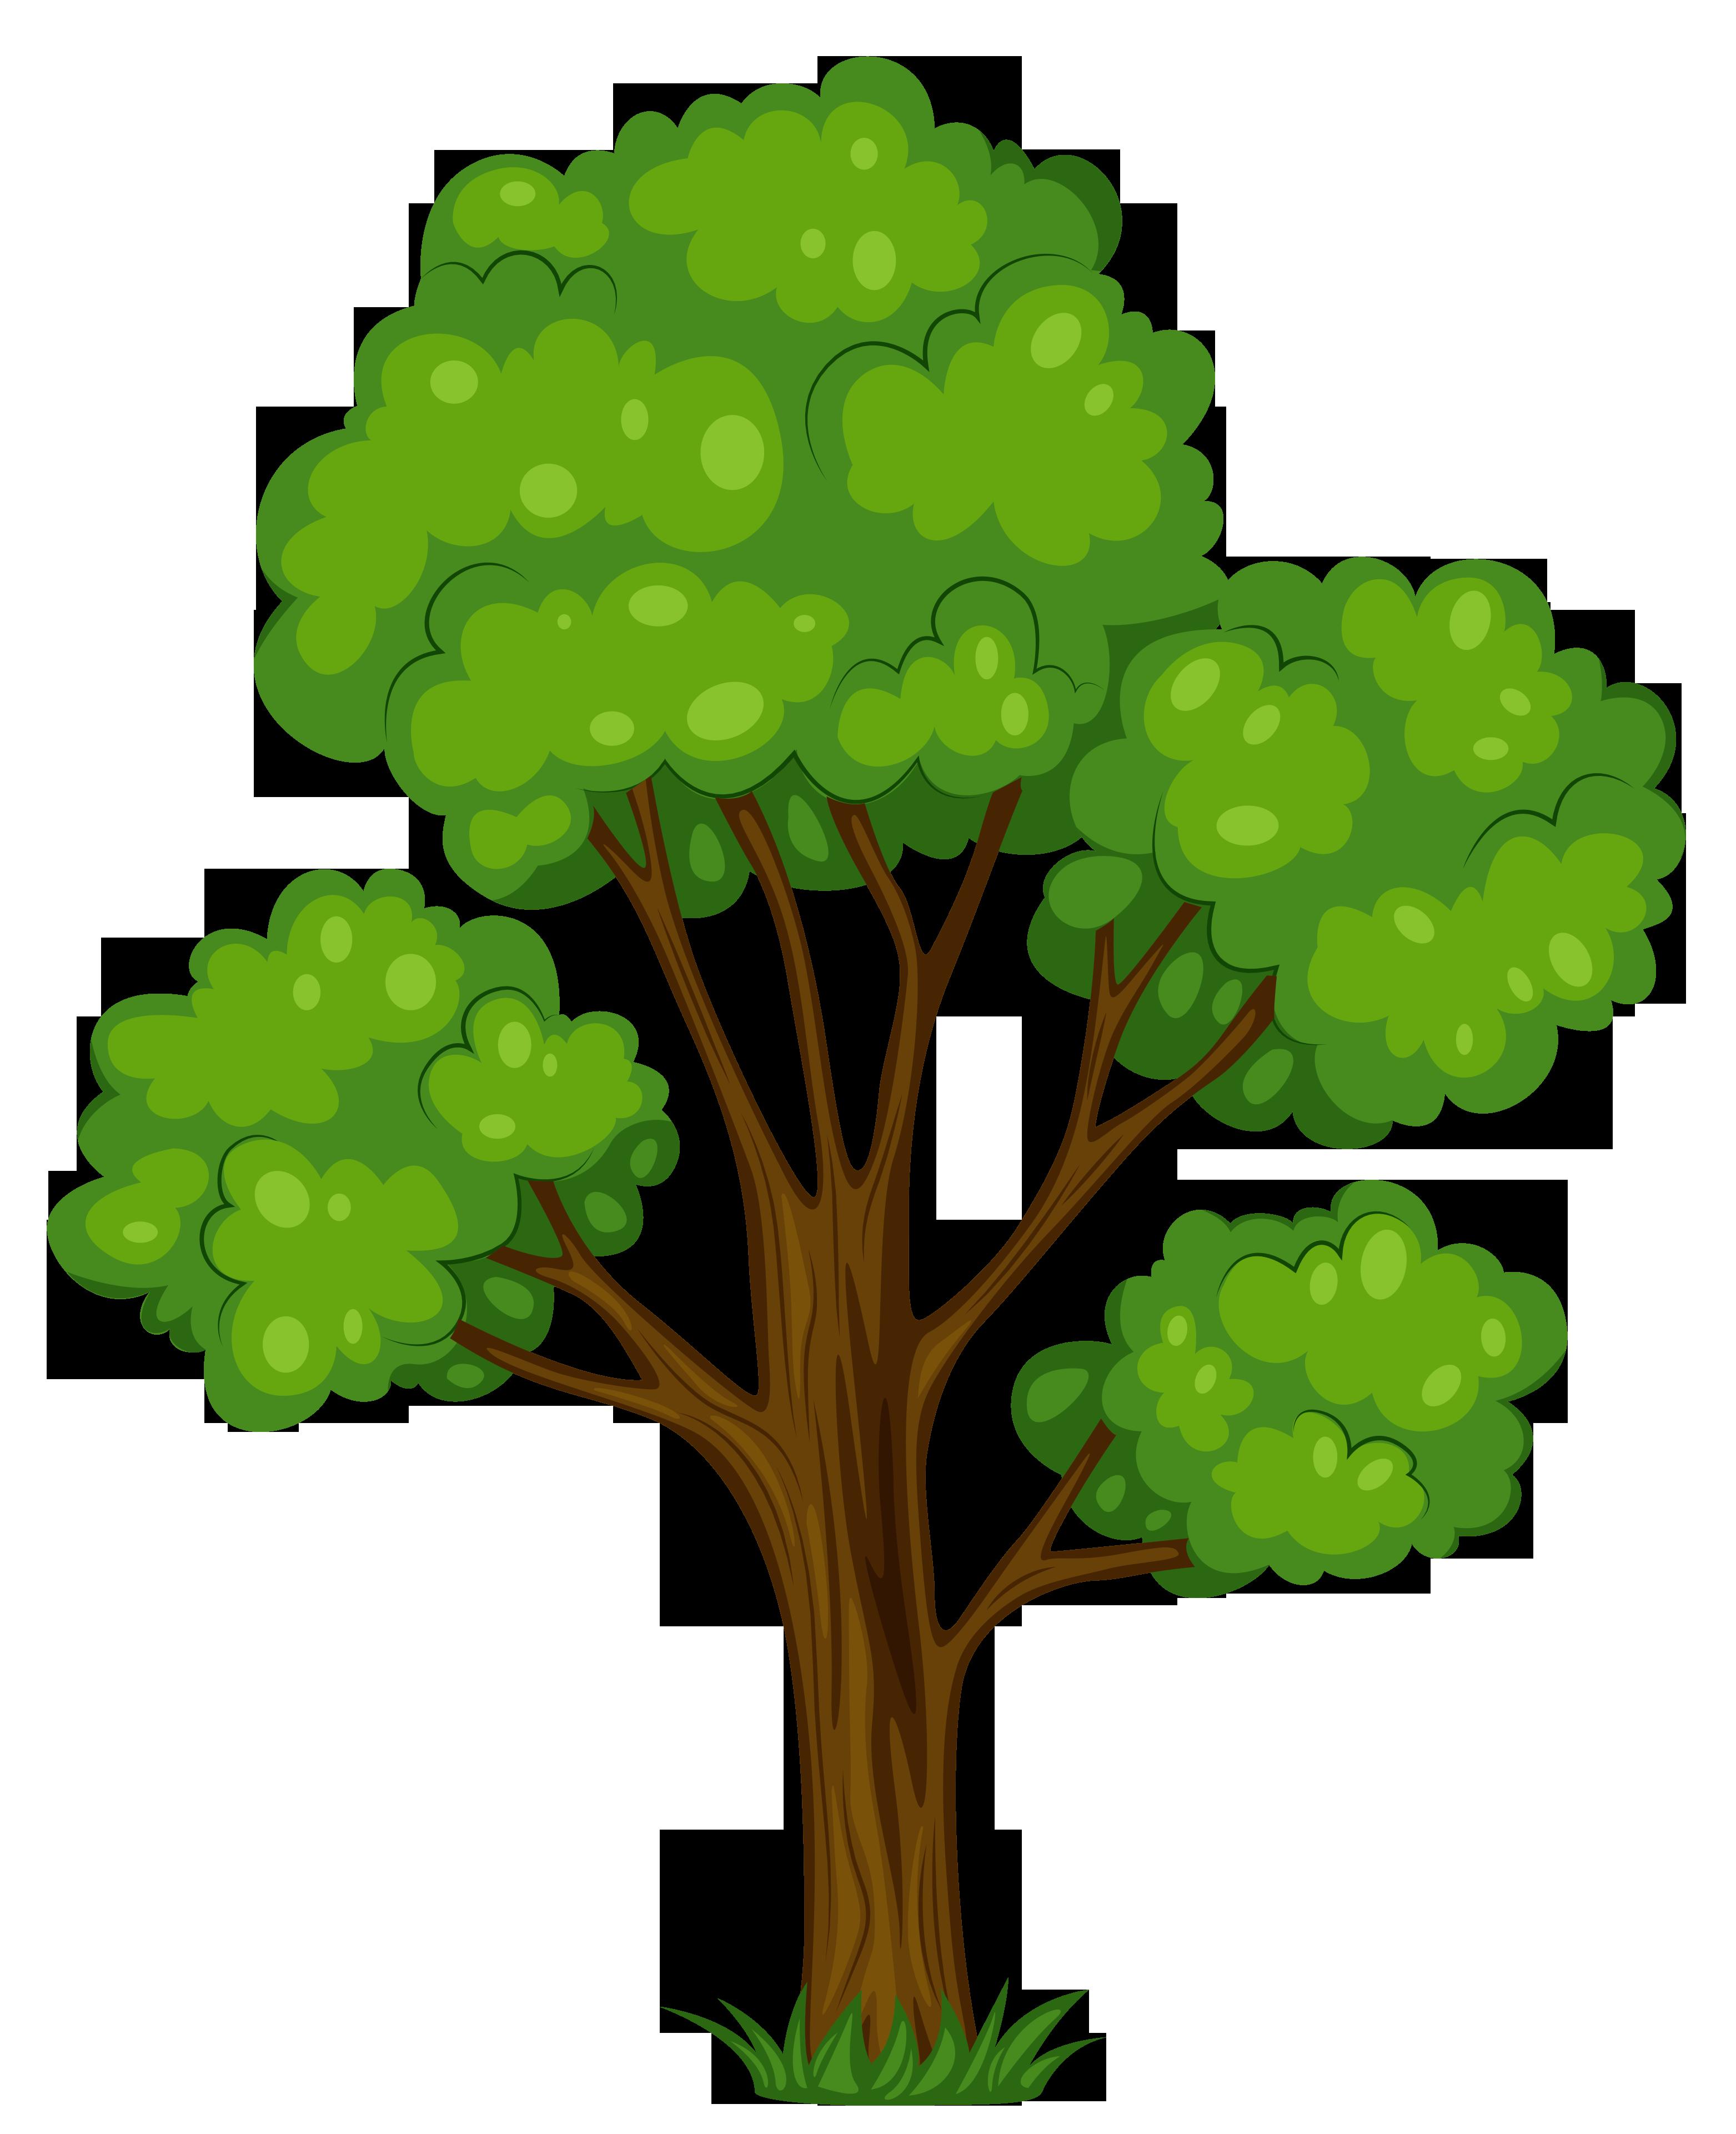 Oak Tree Tree Clip Art Free Clipart Imag-Oak tree tree clip art free clipart image clipart image-10